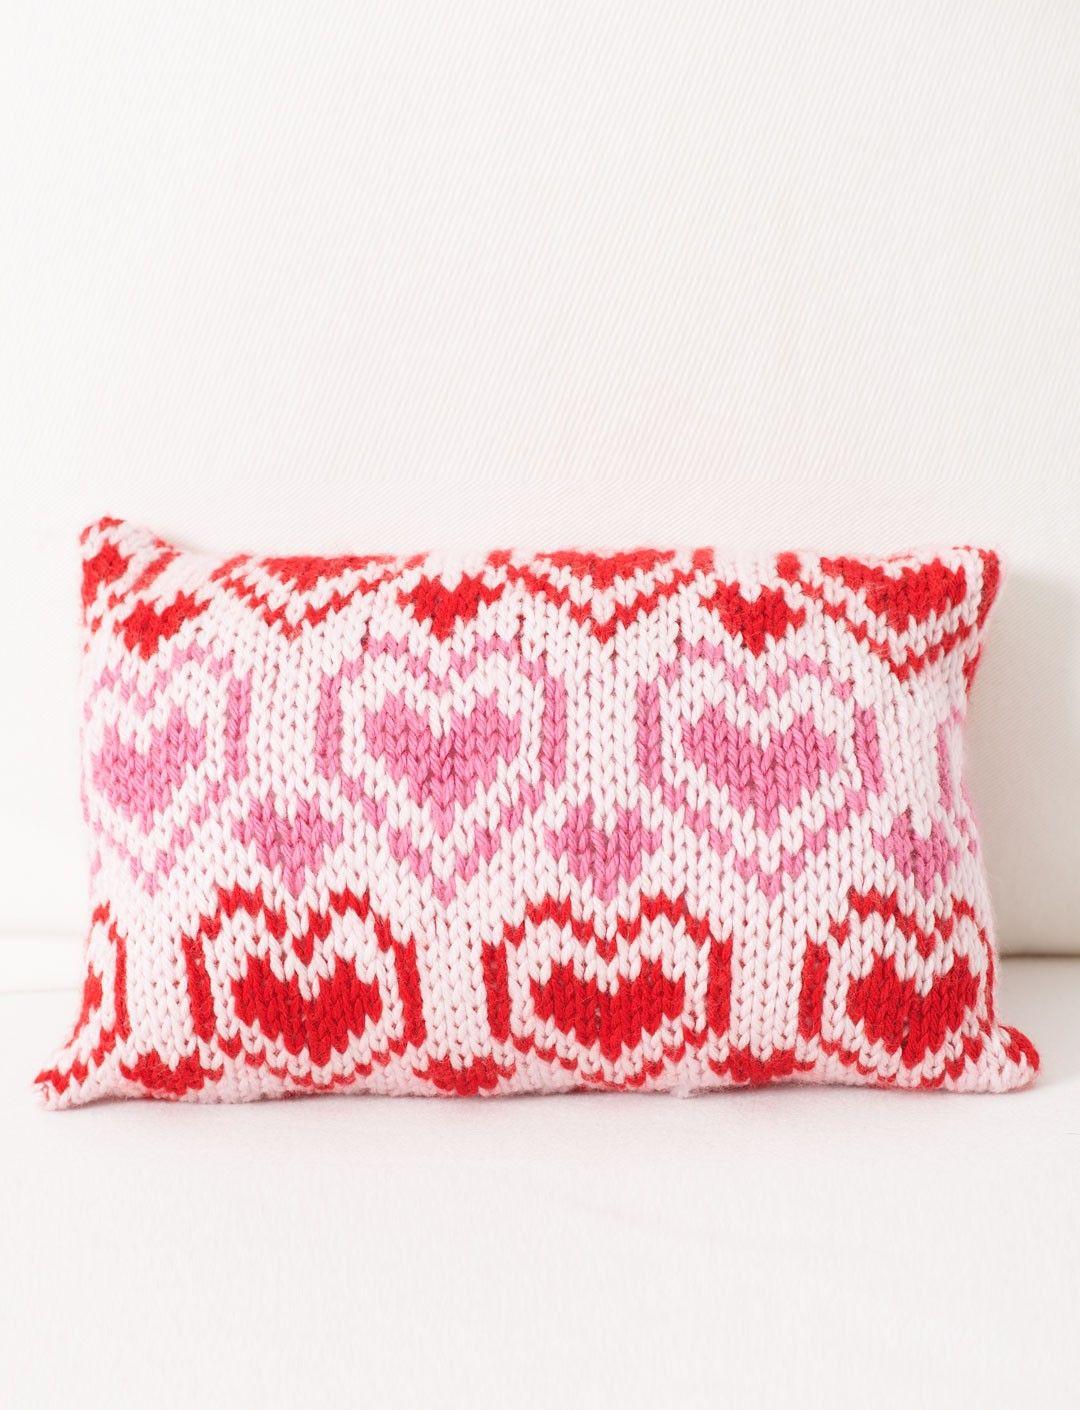 Yarnspirations.com - Bernat Comfort Pillow - Patterns ...